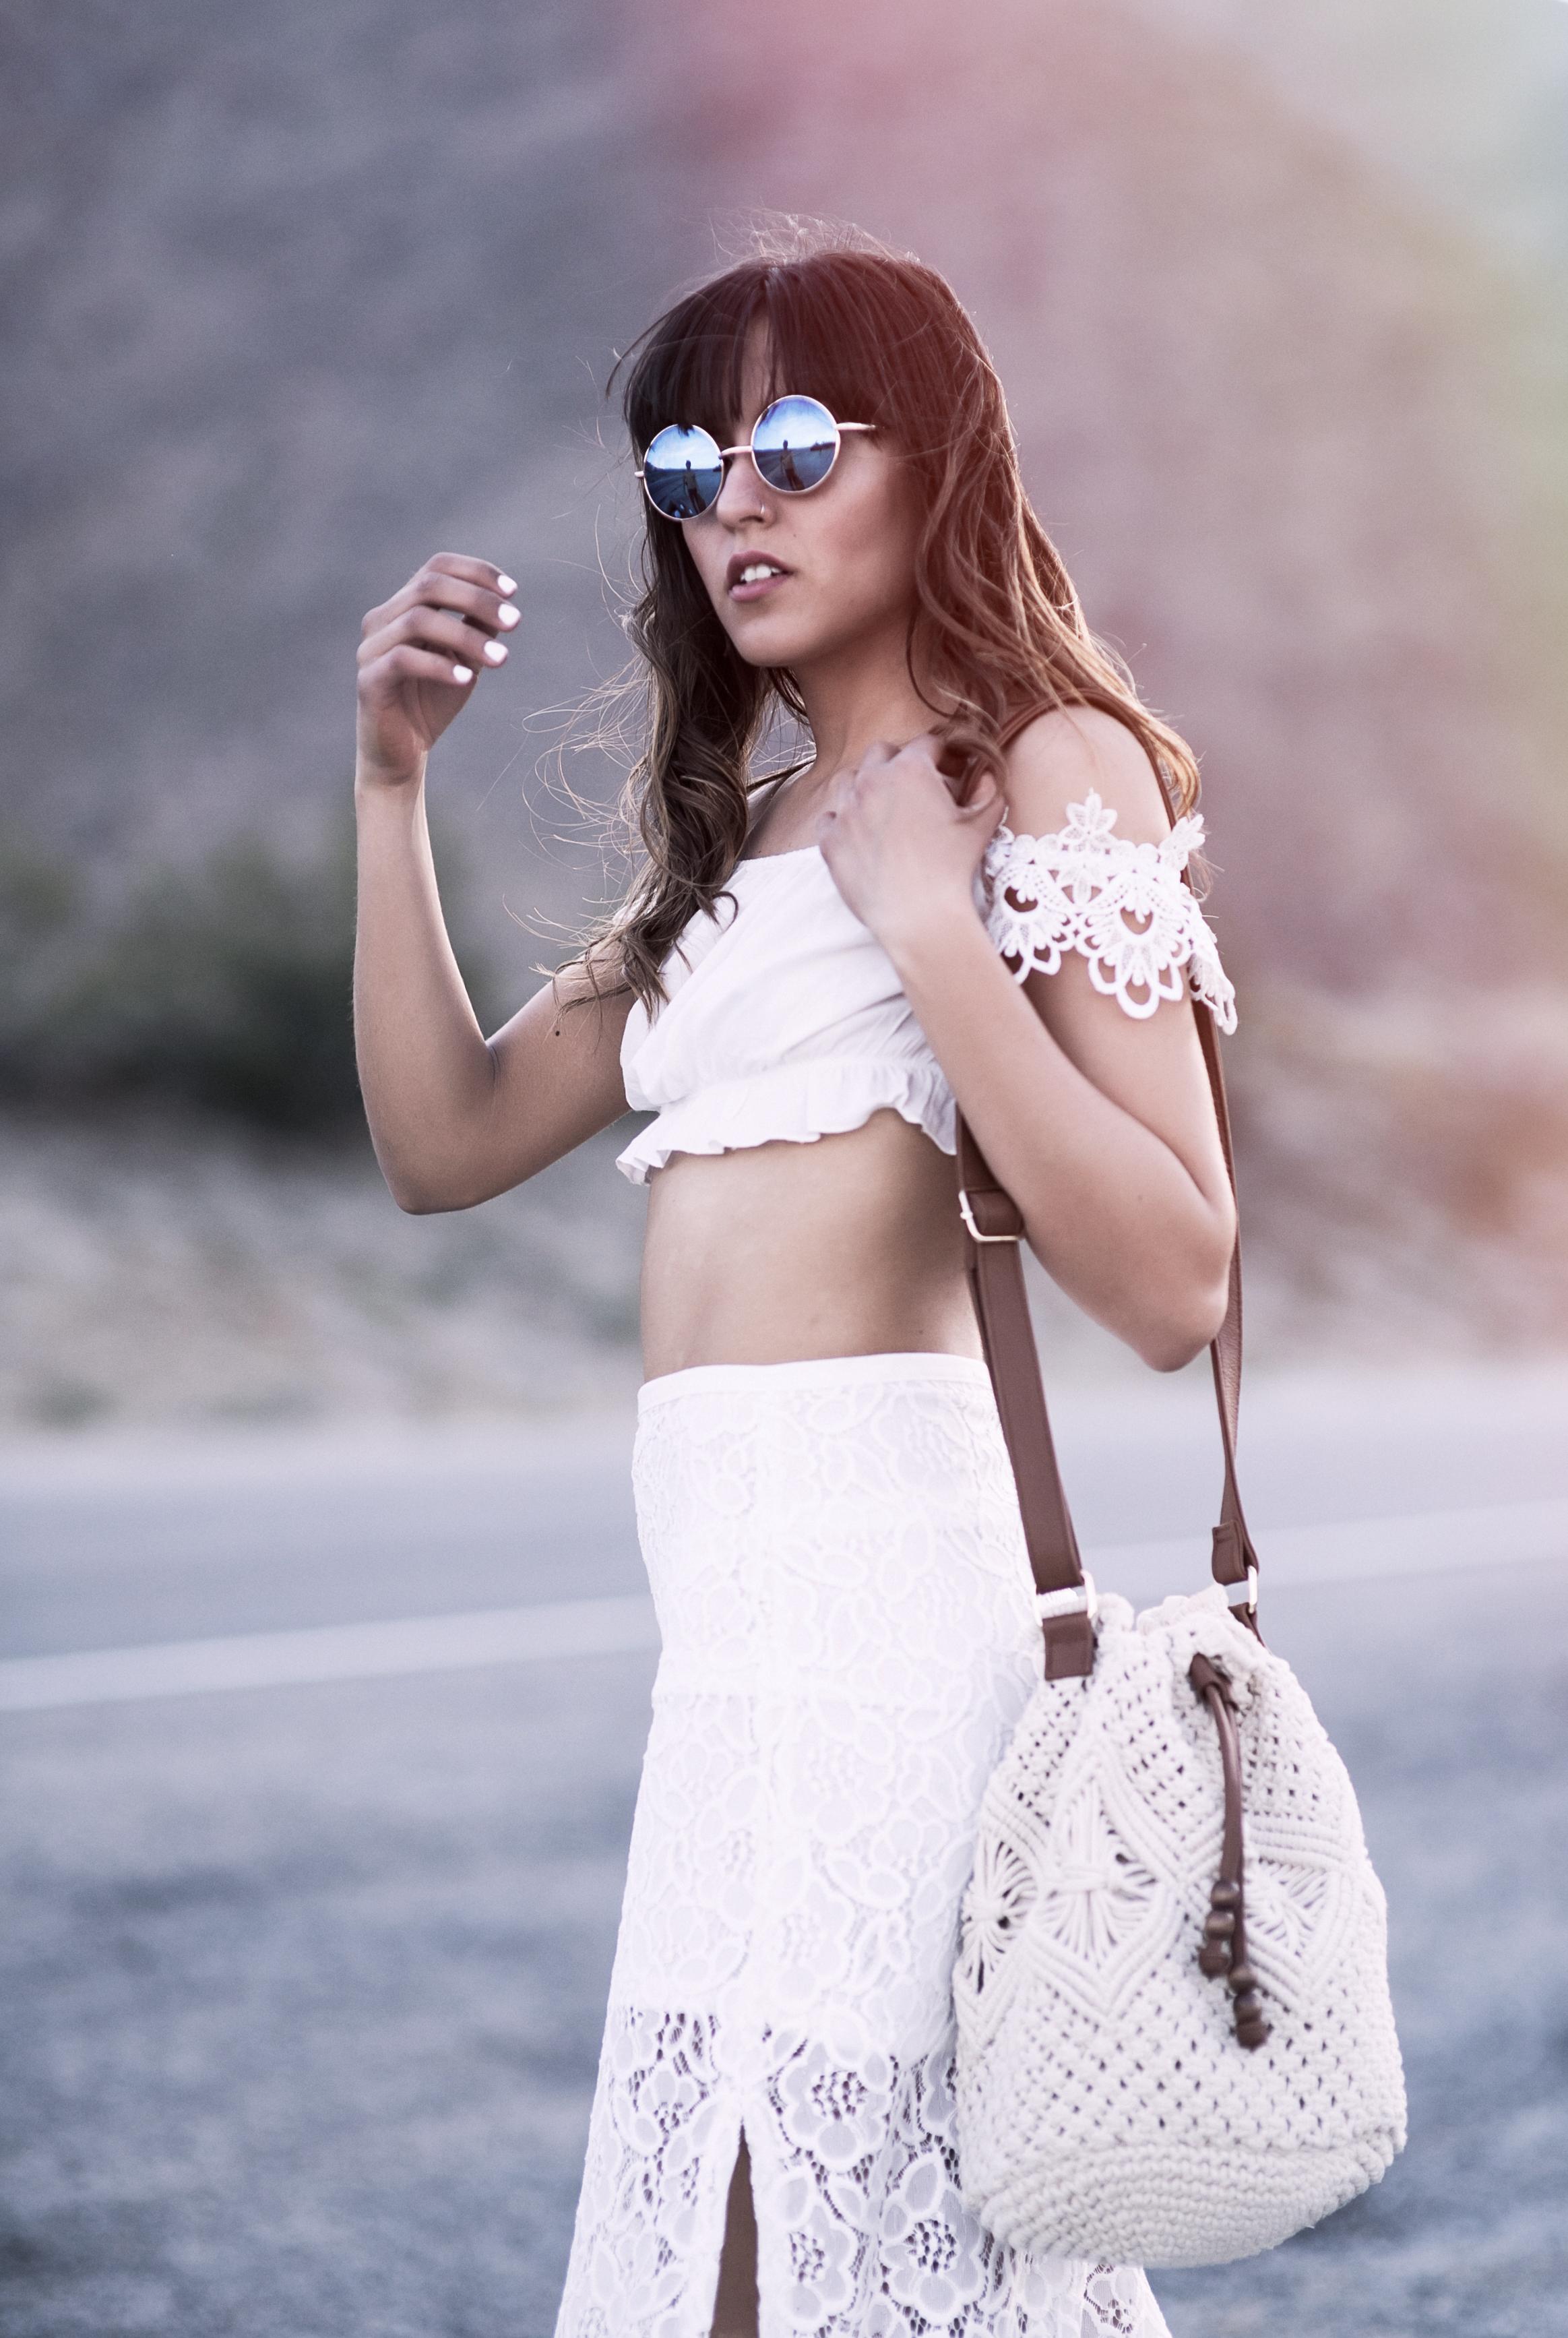 cochella-outfit-tobi-callitspring-fashion-blogger-raquel-paiva